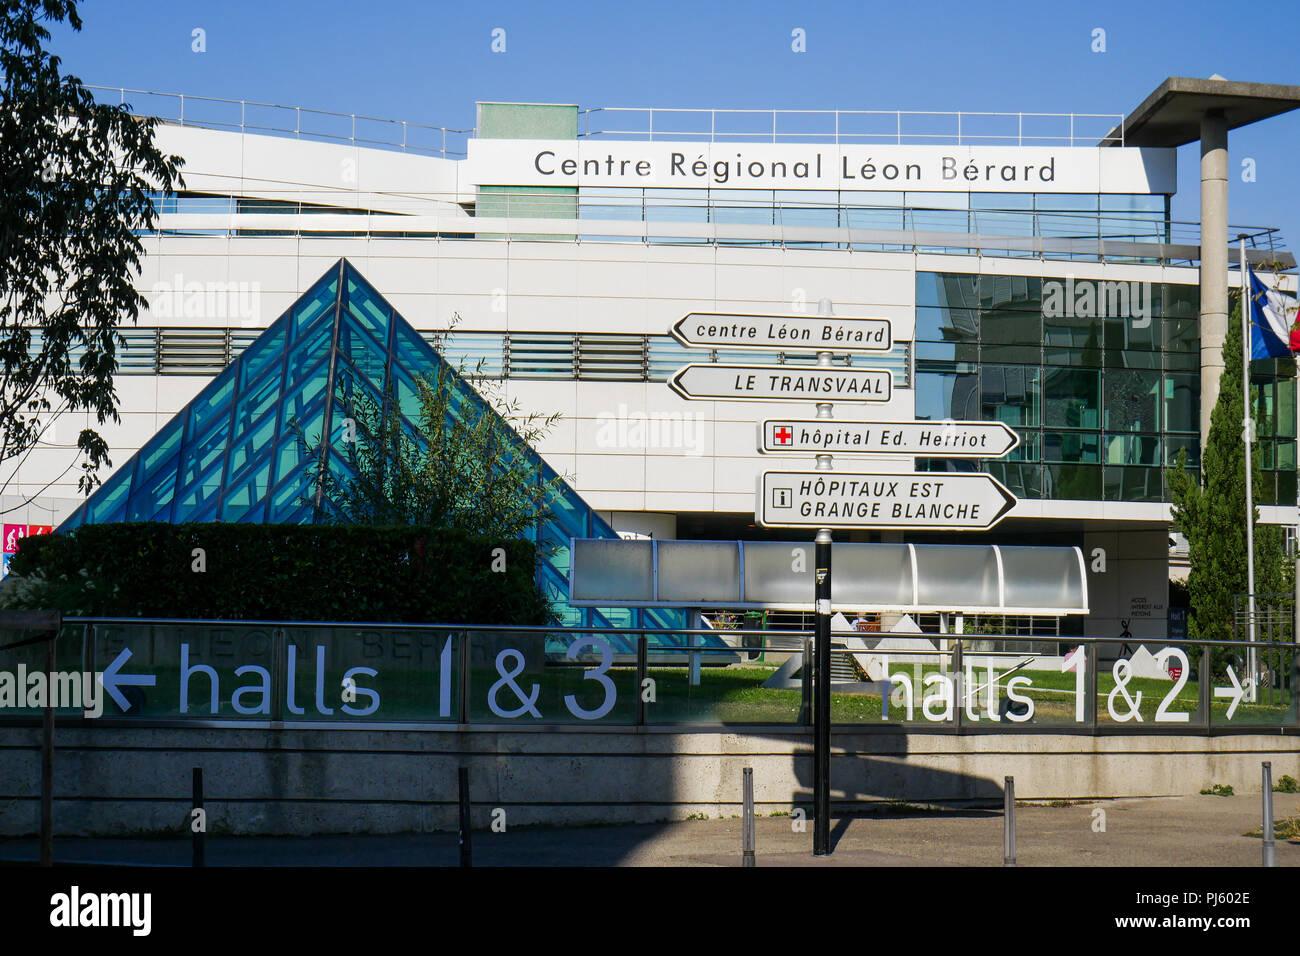 Leon Berard cancer treatment centre, Lyon, France - Stock Image